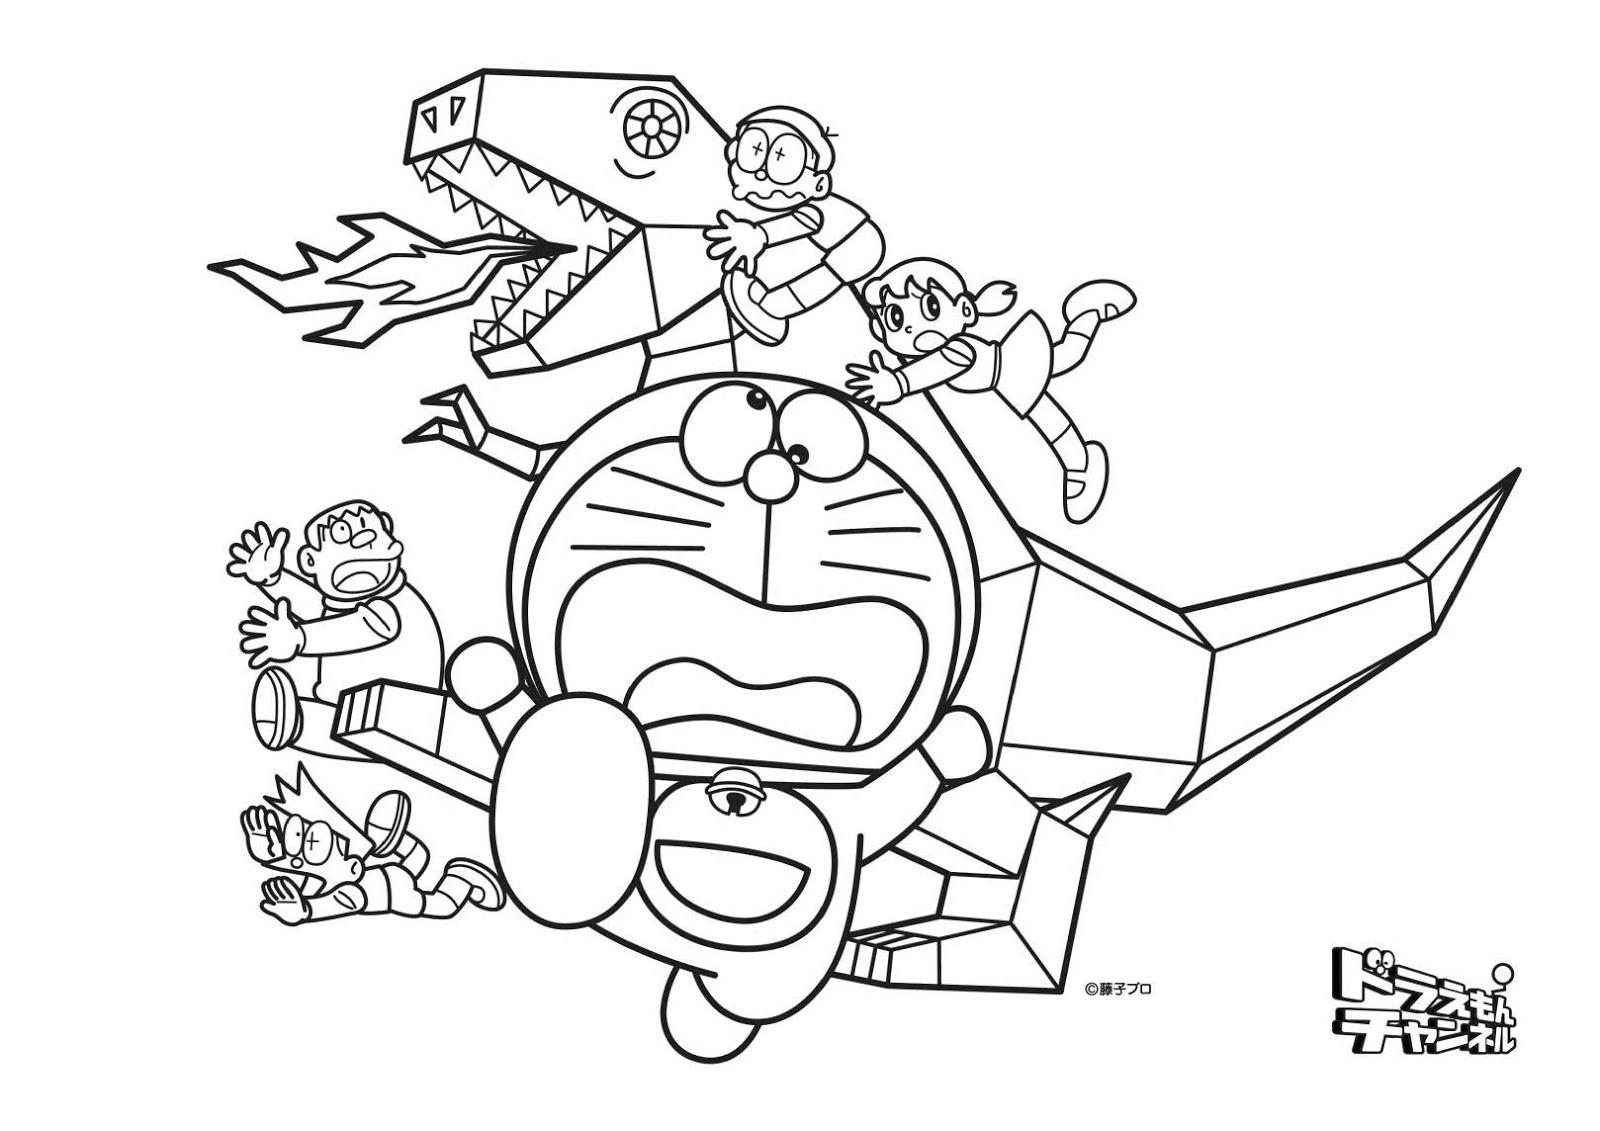 Kumpulan Mewarnai Gambar Doraemon Pemandangan Kartun Masjid Mobil Boneka